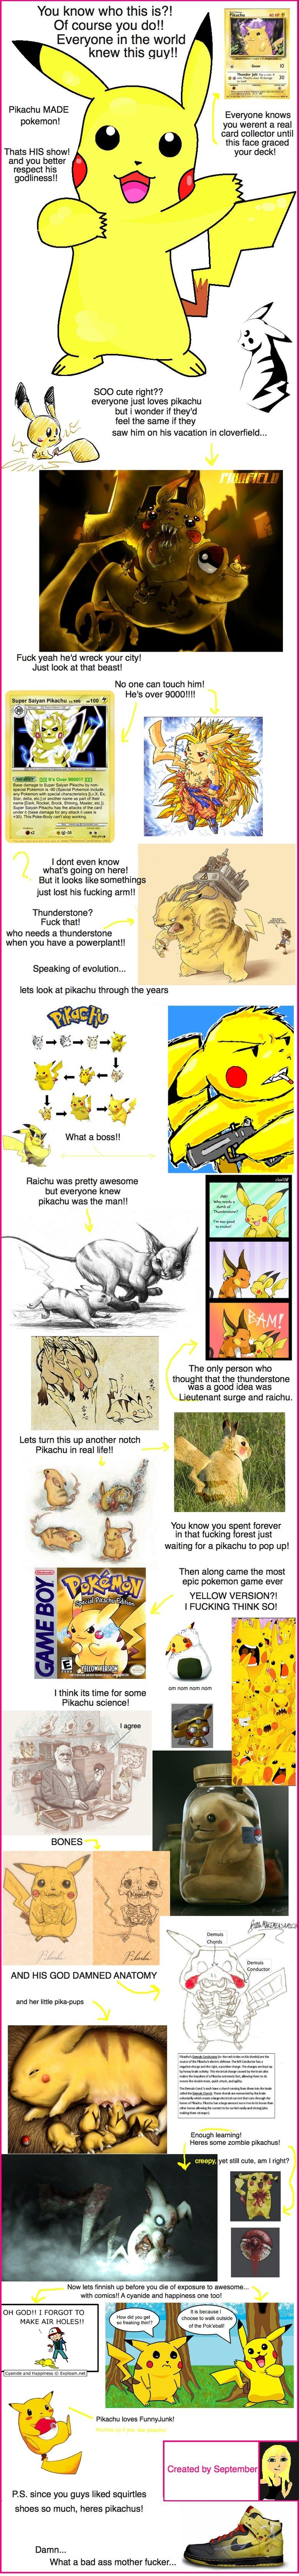 Ode to Pikachu!. Re-uploading my old junk <br /> original: funnyjunk.com/funny_pictures/443090/Ode+to+Pikachu/.. Dear September Marry Me